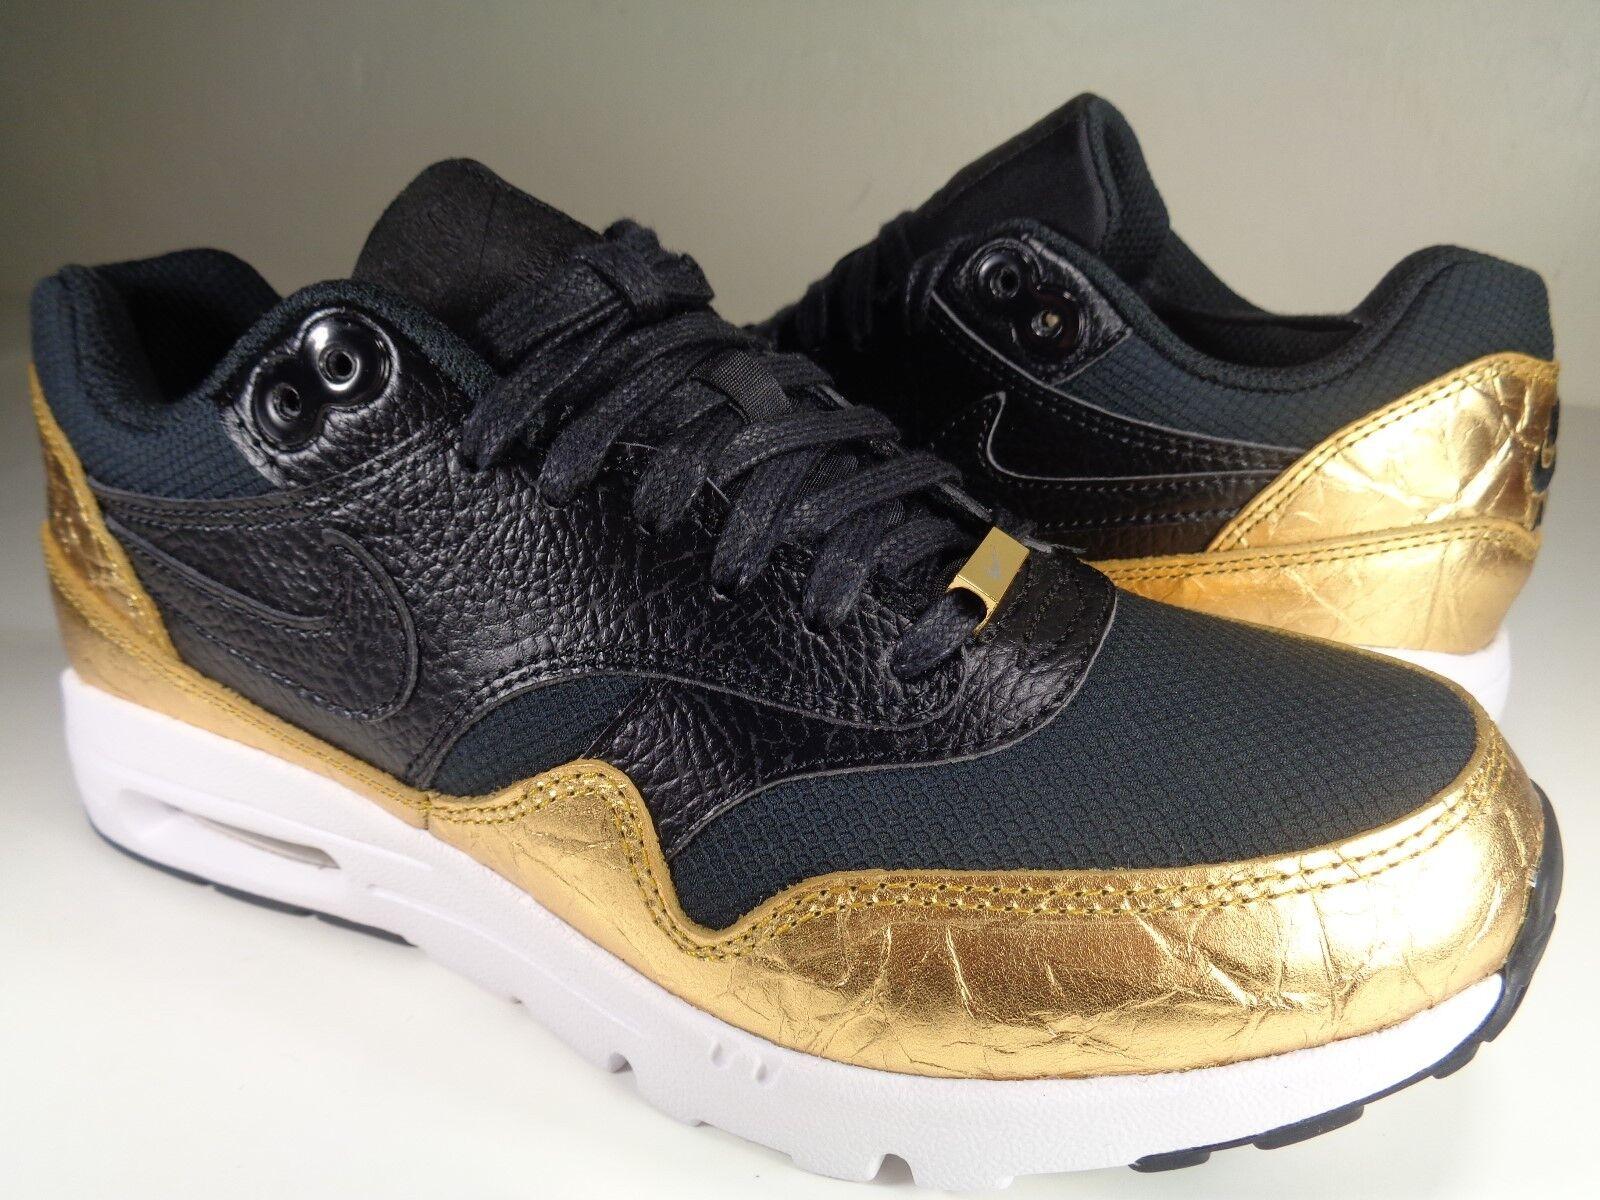 Nike scarpa air max donne proposta sb scarpa Nike e6762a